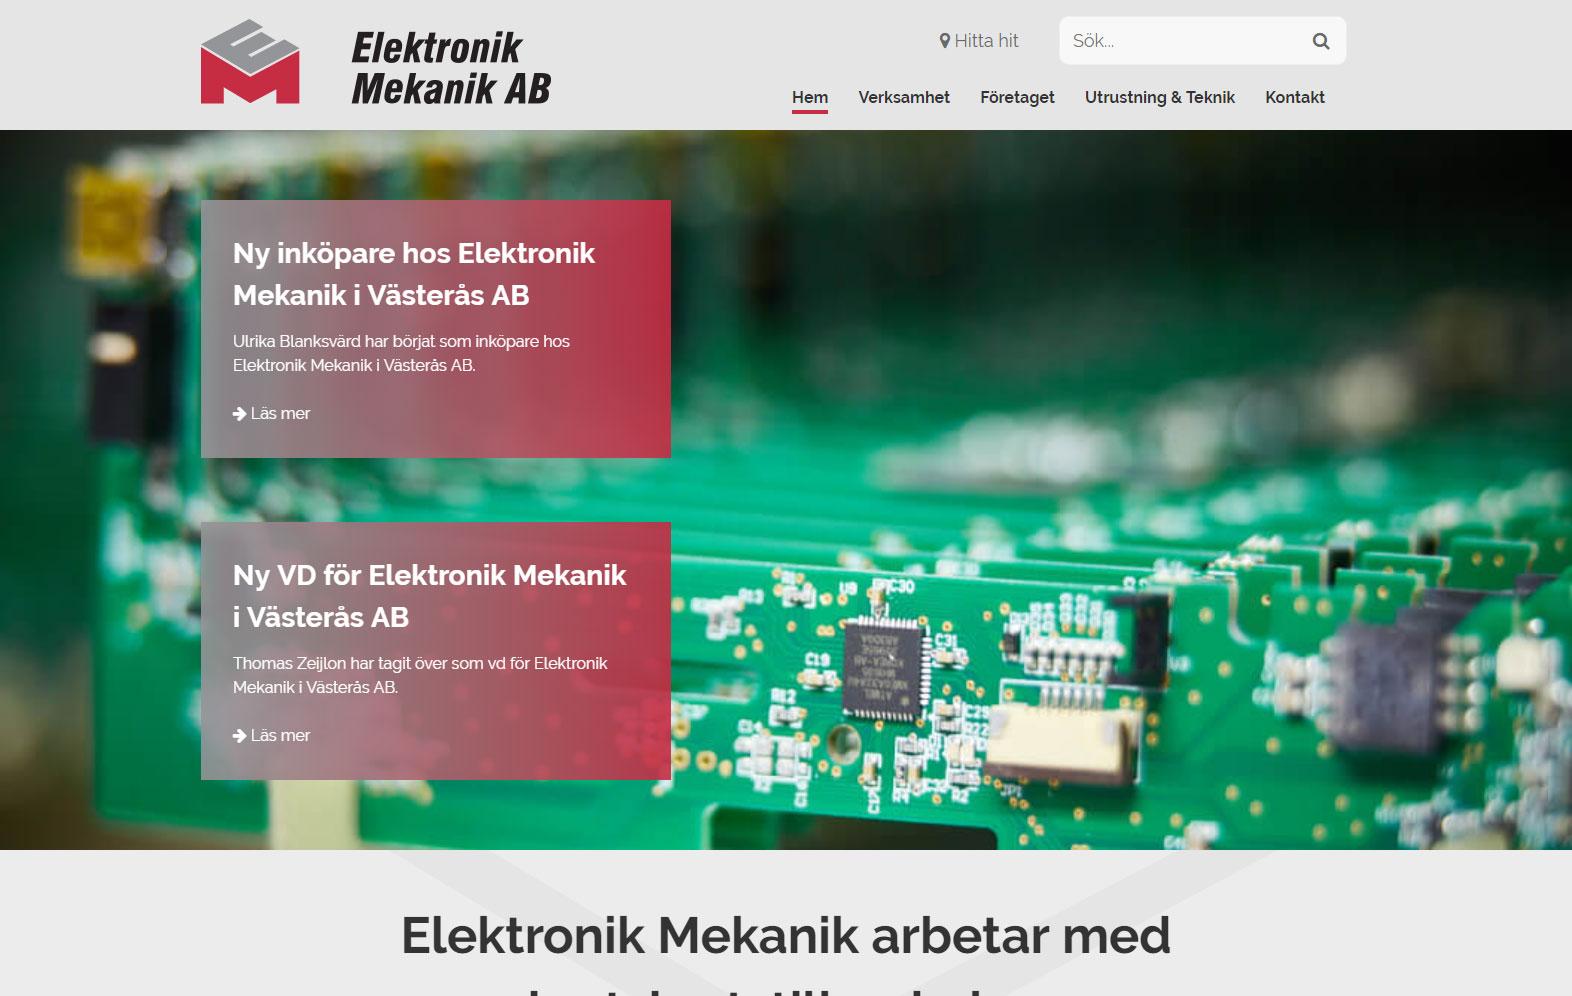 Elektronik Mekanik